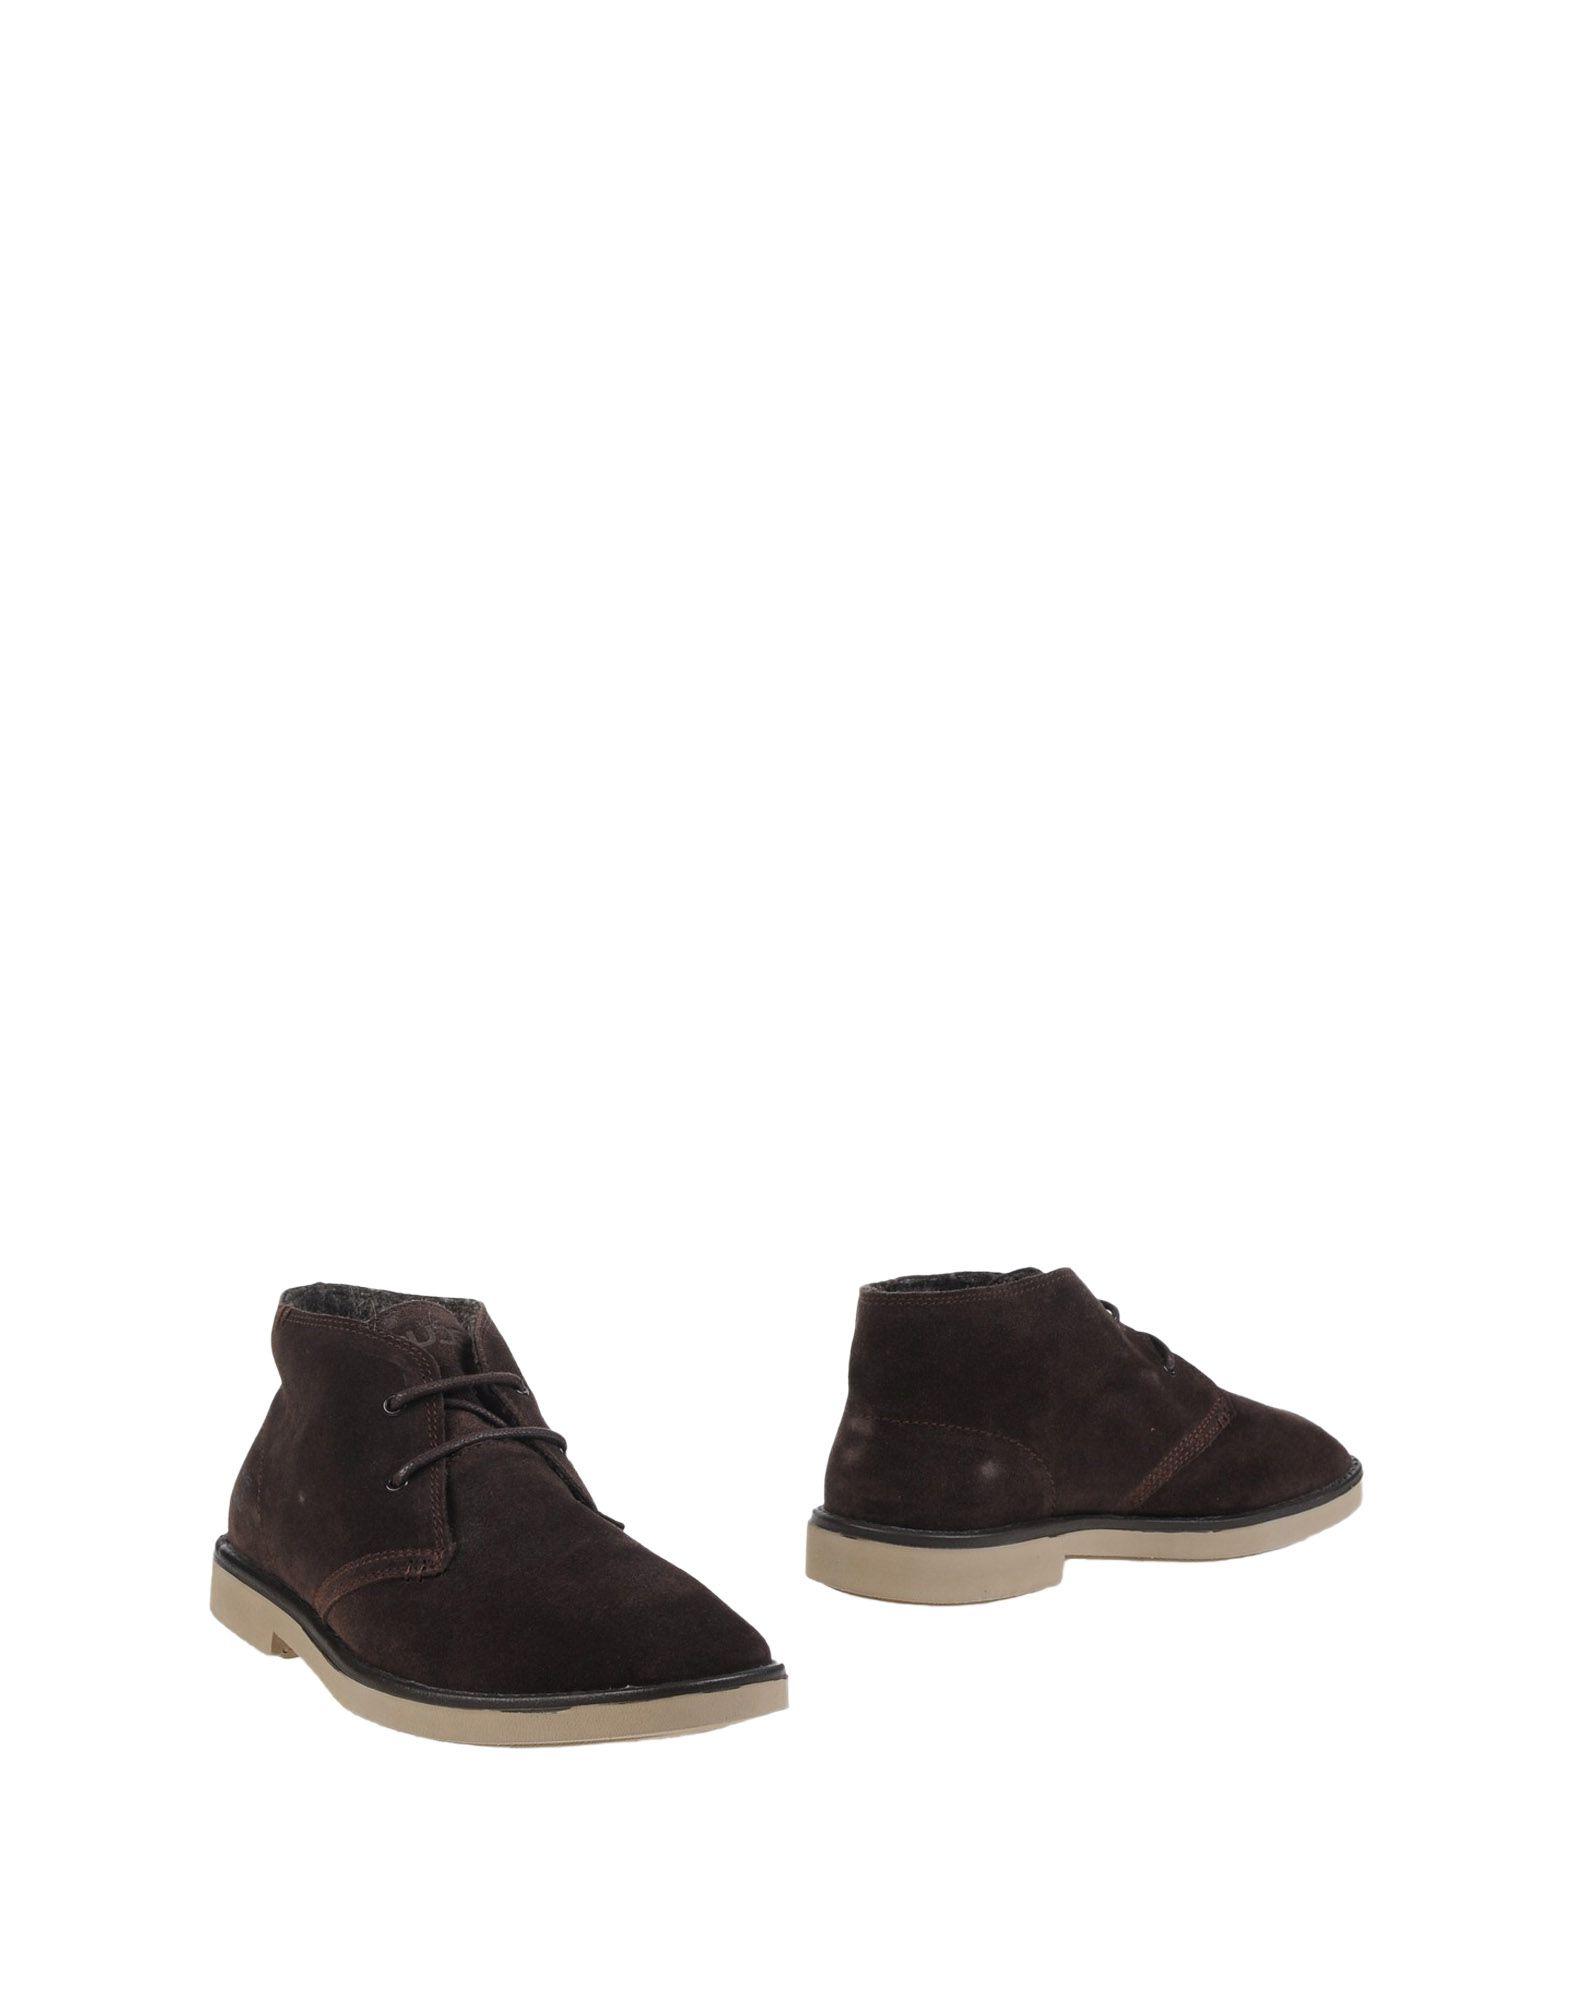 Stivaletti - Hey Dude Shoes Uomo - Stivaletti 11083917KT 13cbdc